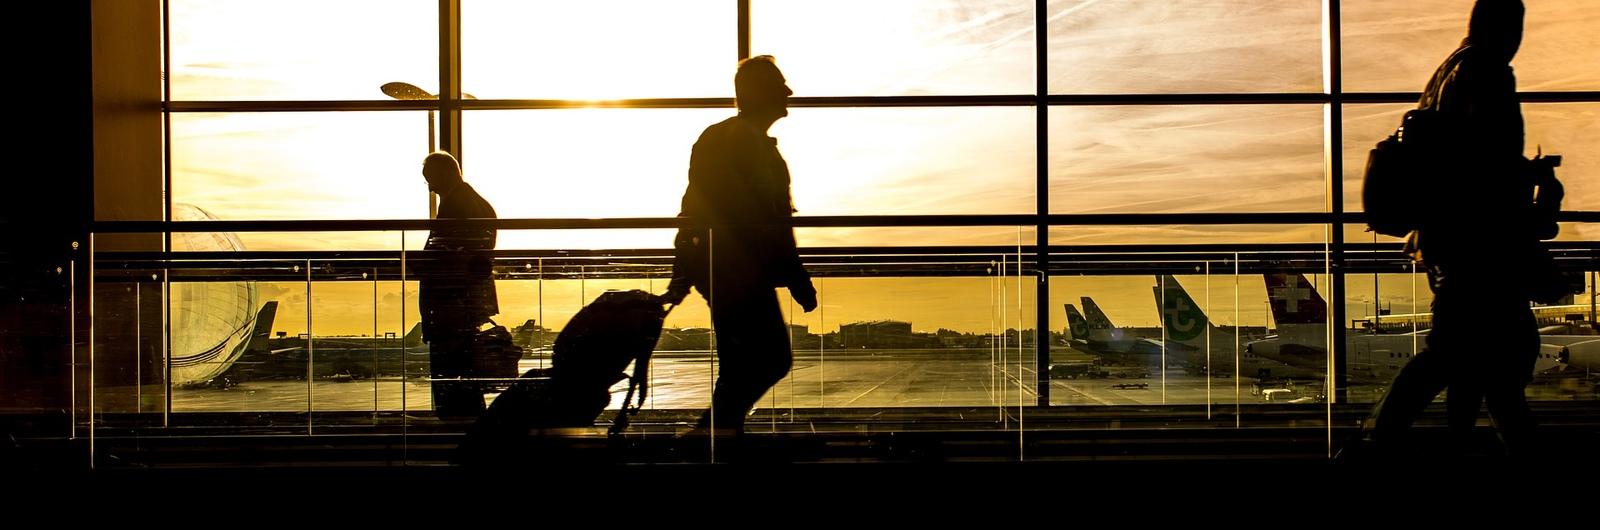 city header luton airport